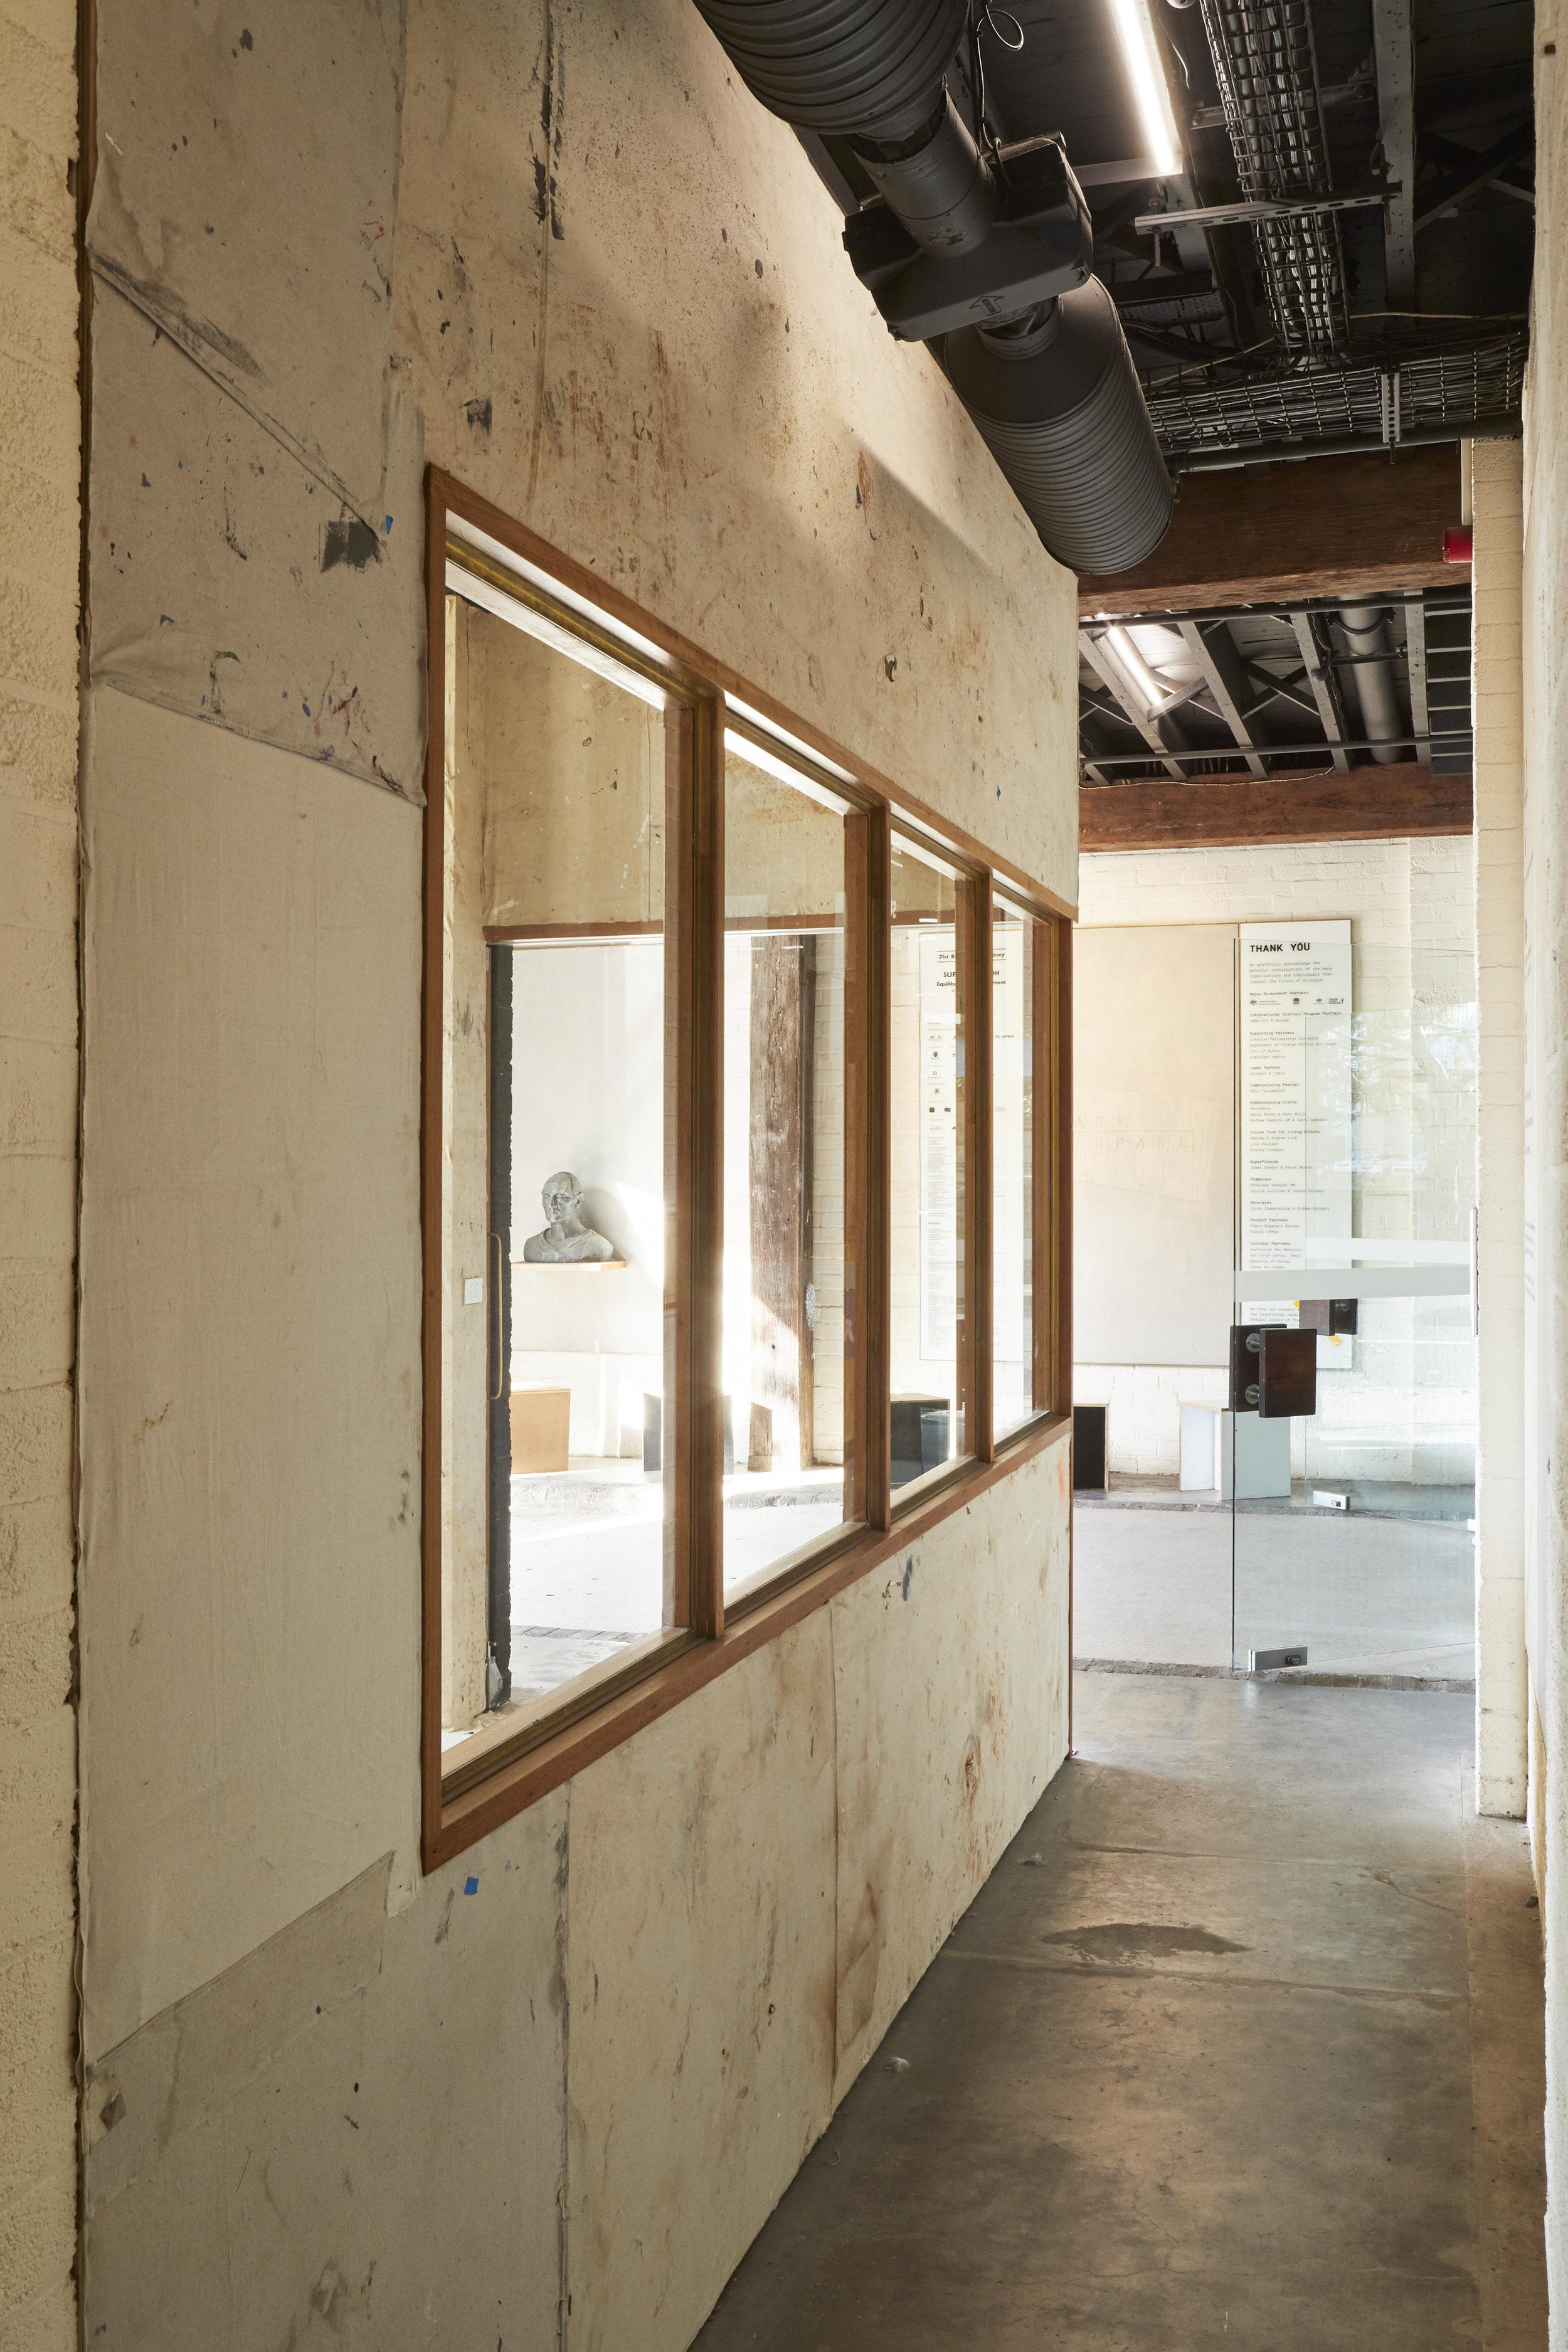 Personal Space , 2018, Ideas Platform, Artspace, Woolloomooloo, Sydney